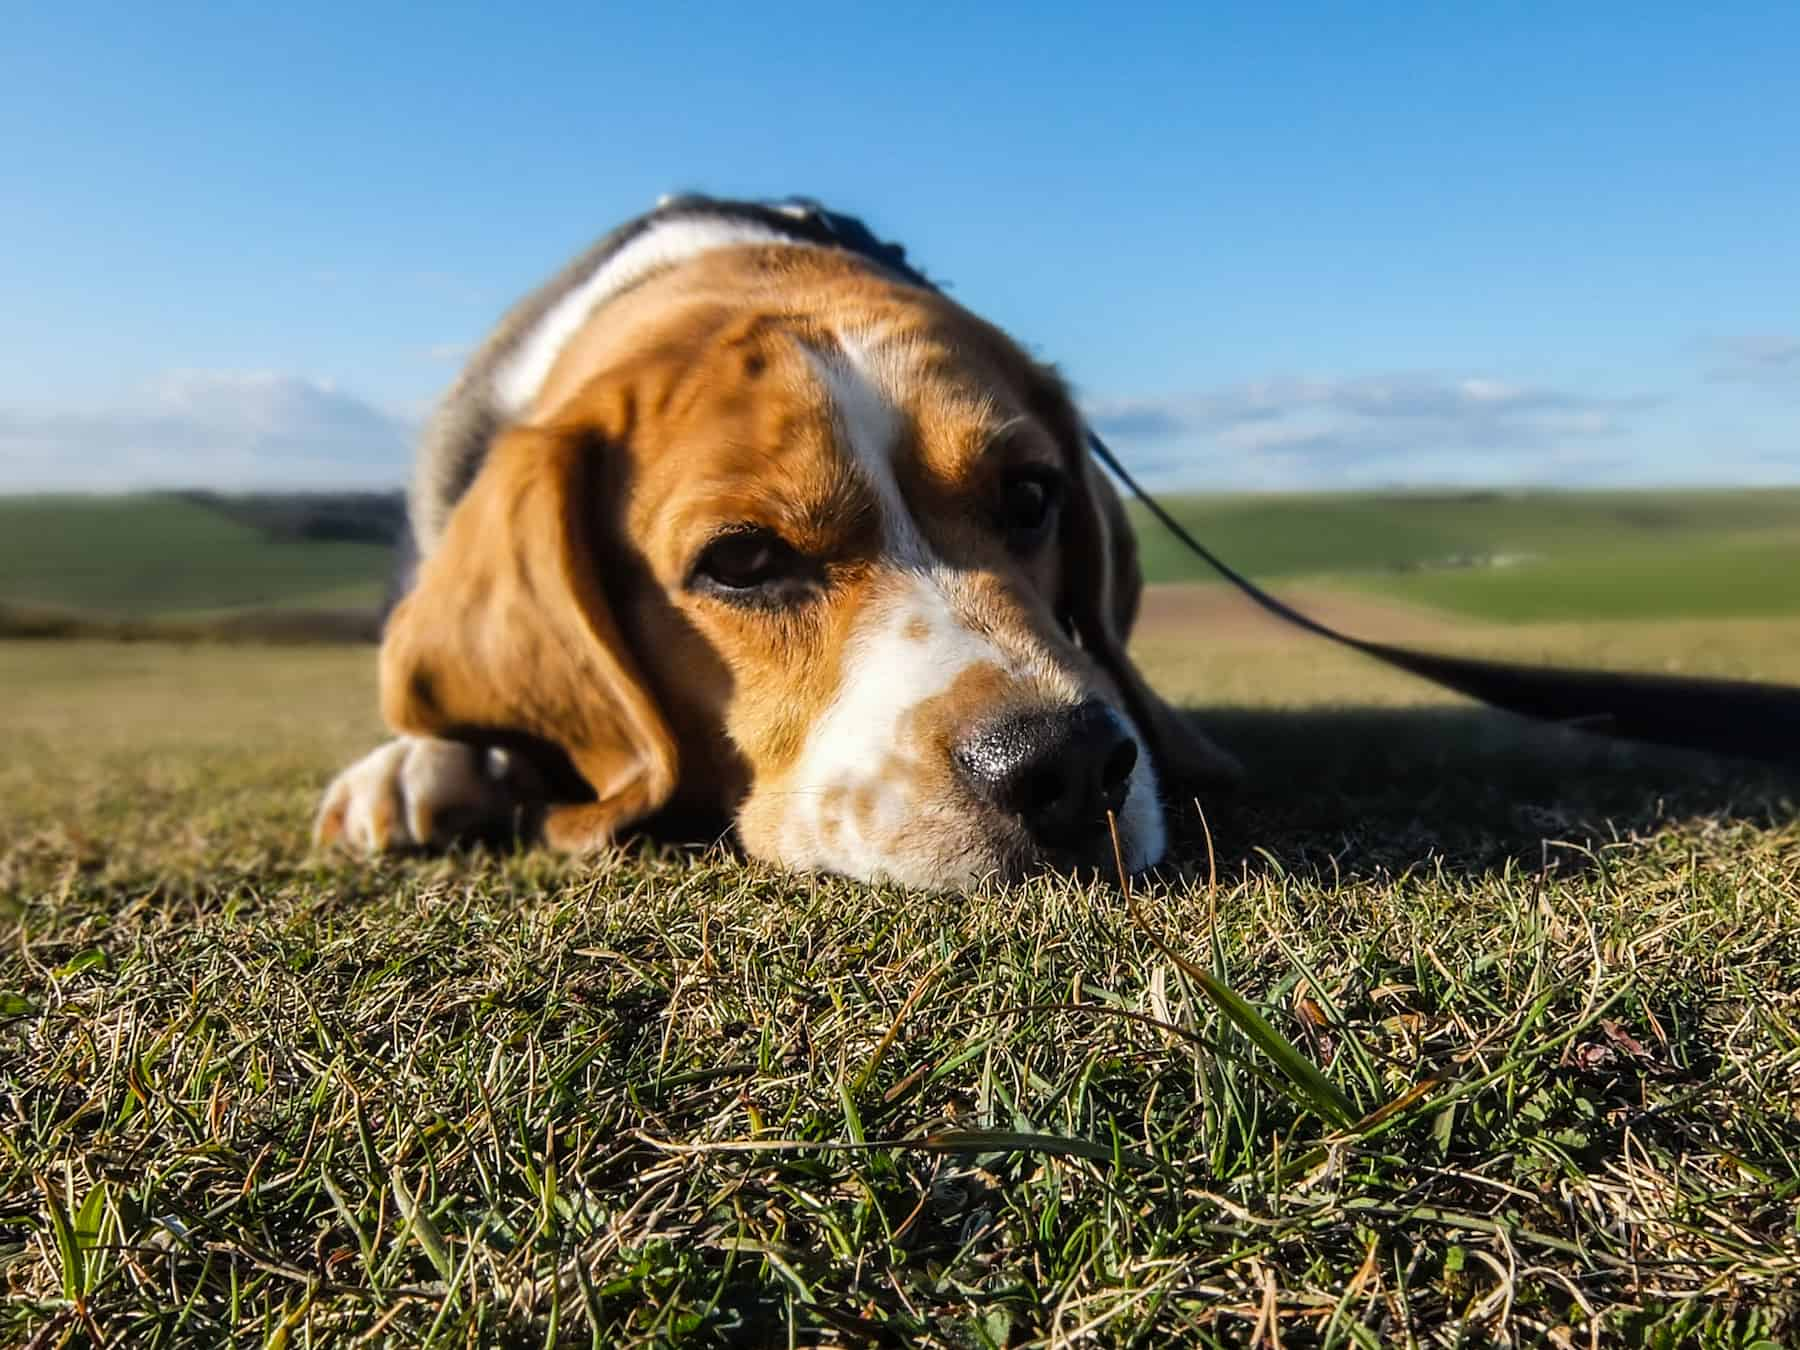 sick dog on grass